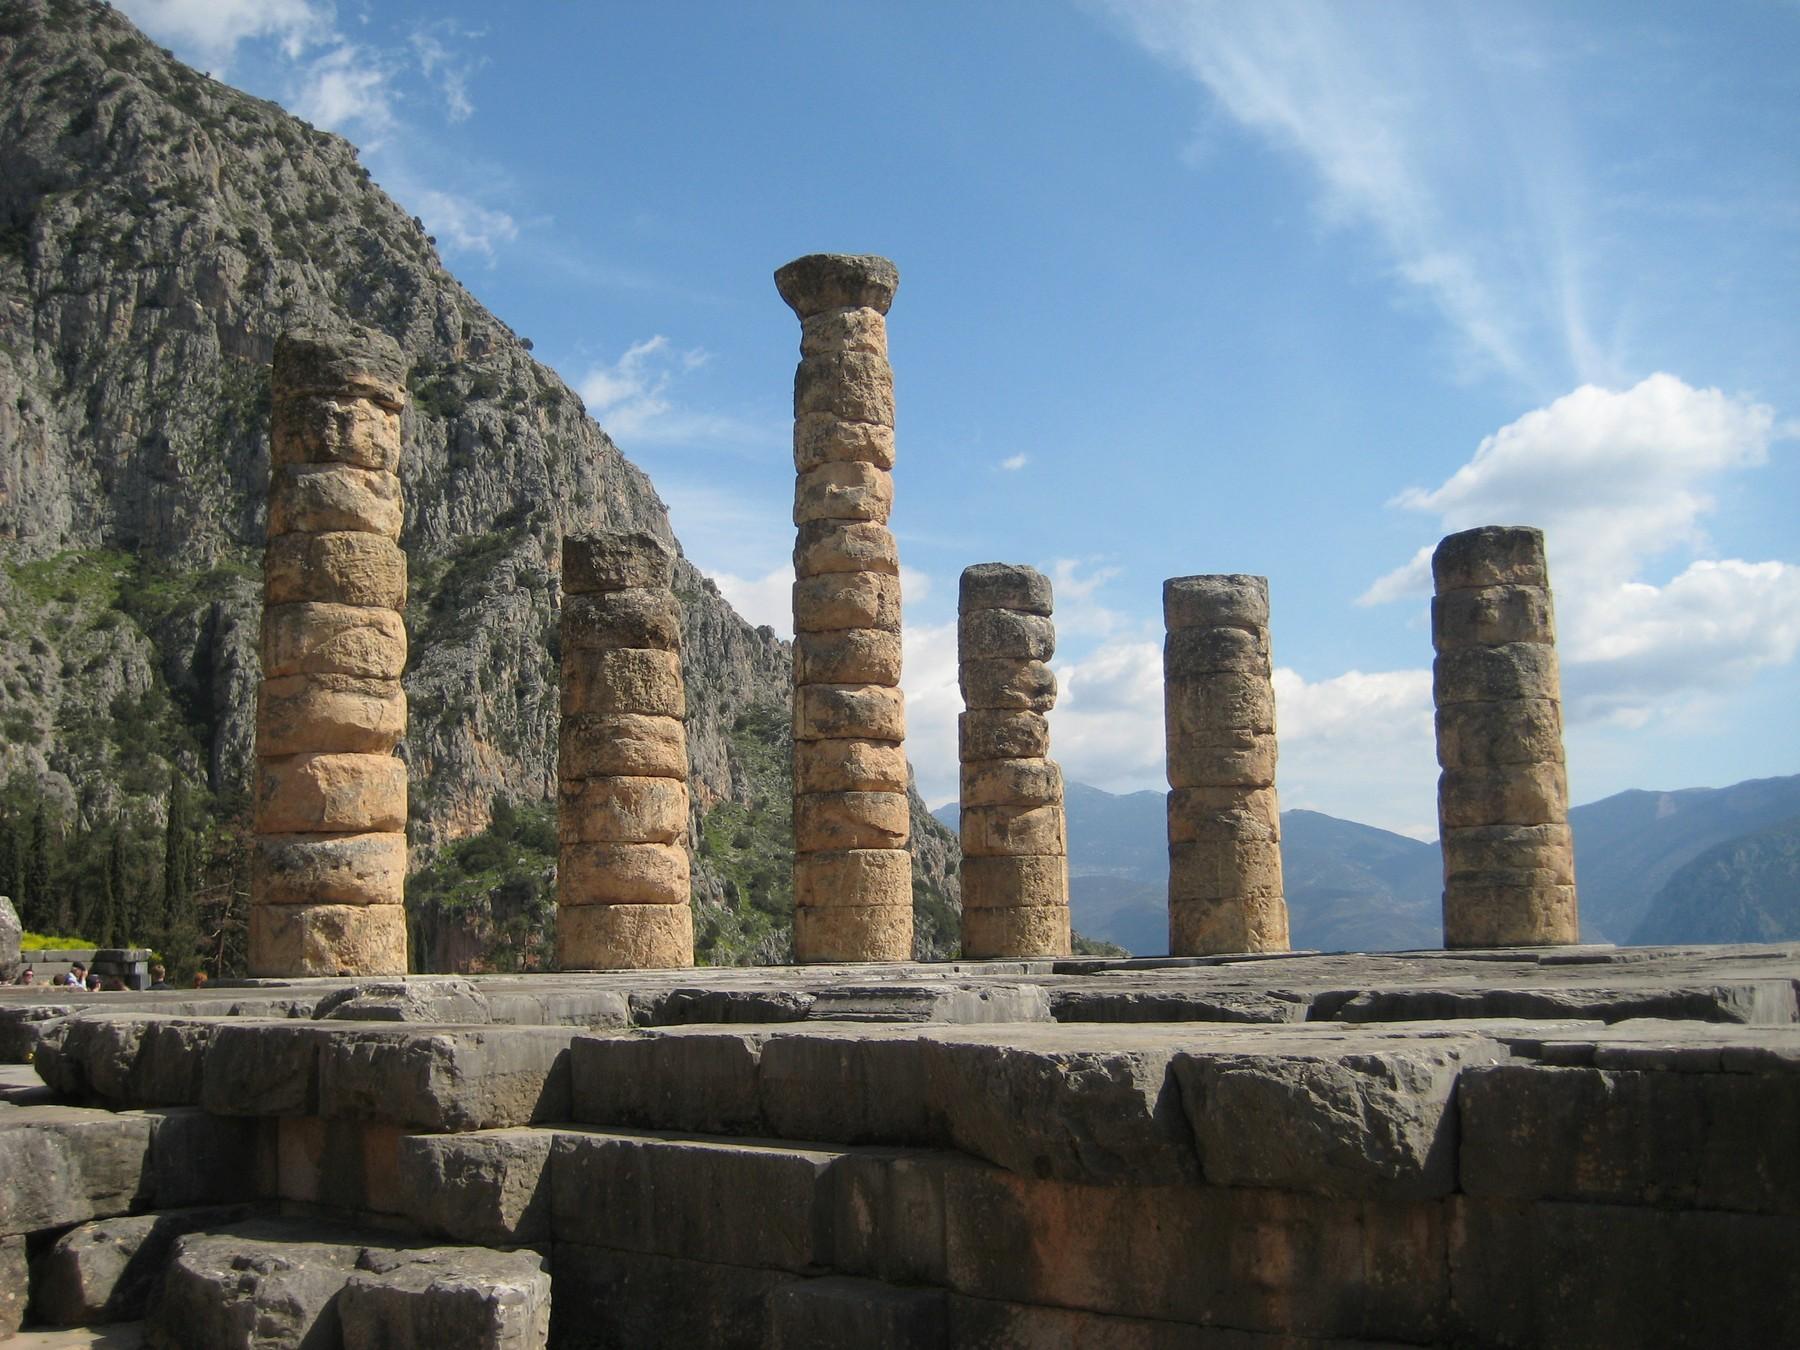 Columns_of_the_Temple_of_Apollo_at_Delphi-_Greece.jpeg